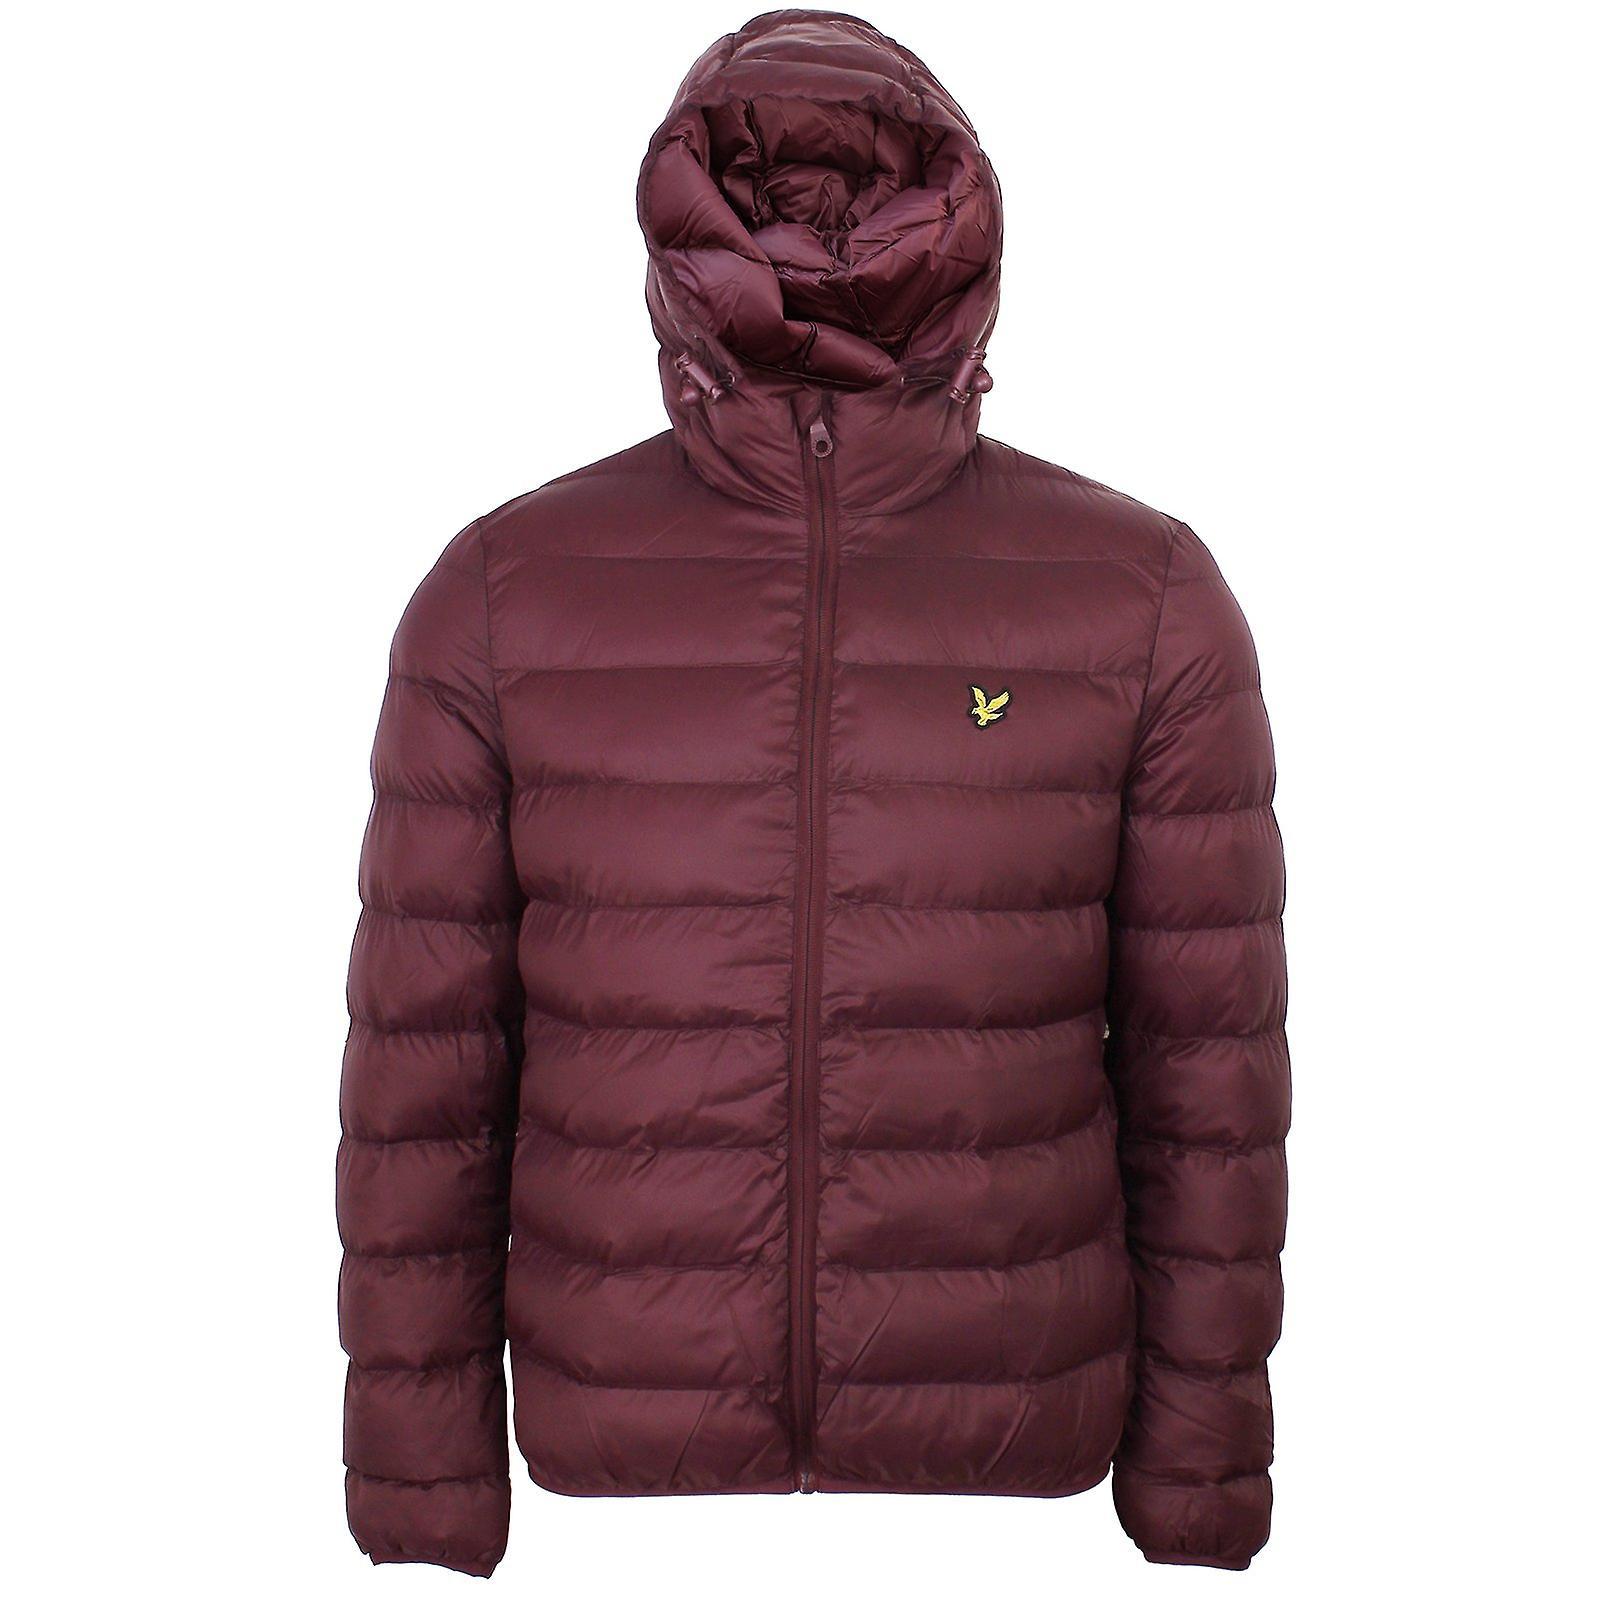 Lyle & scott men's burgundy puffer jacket